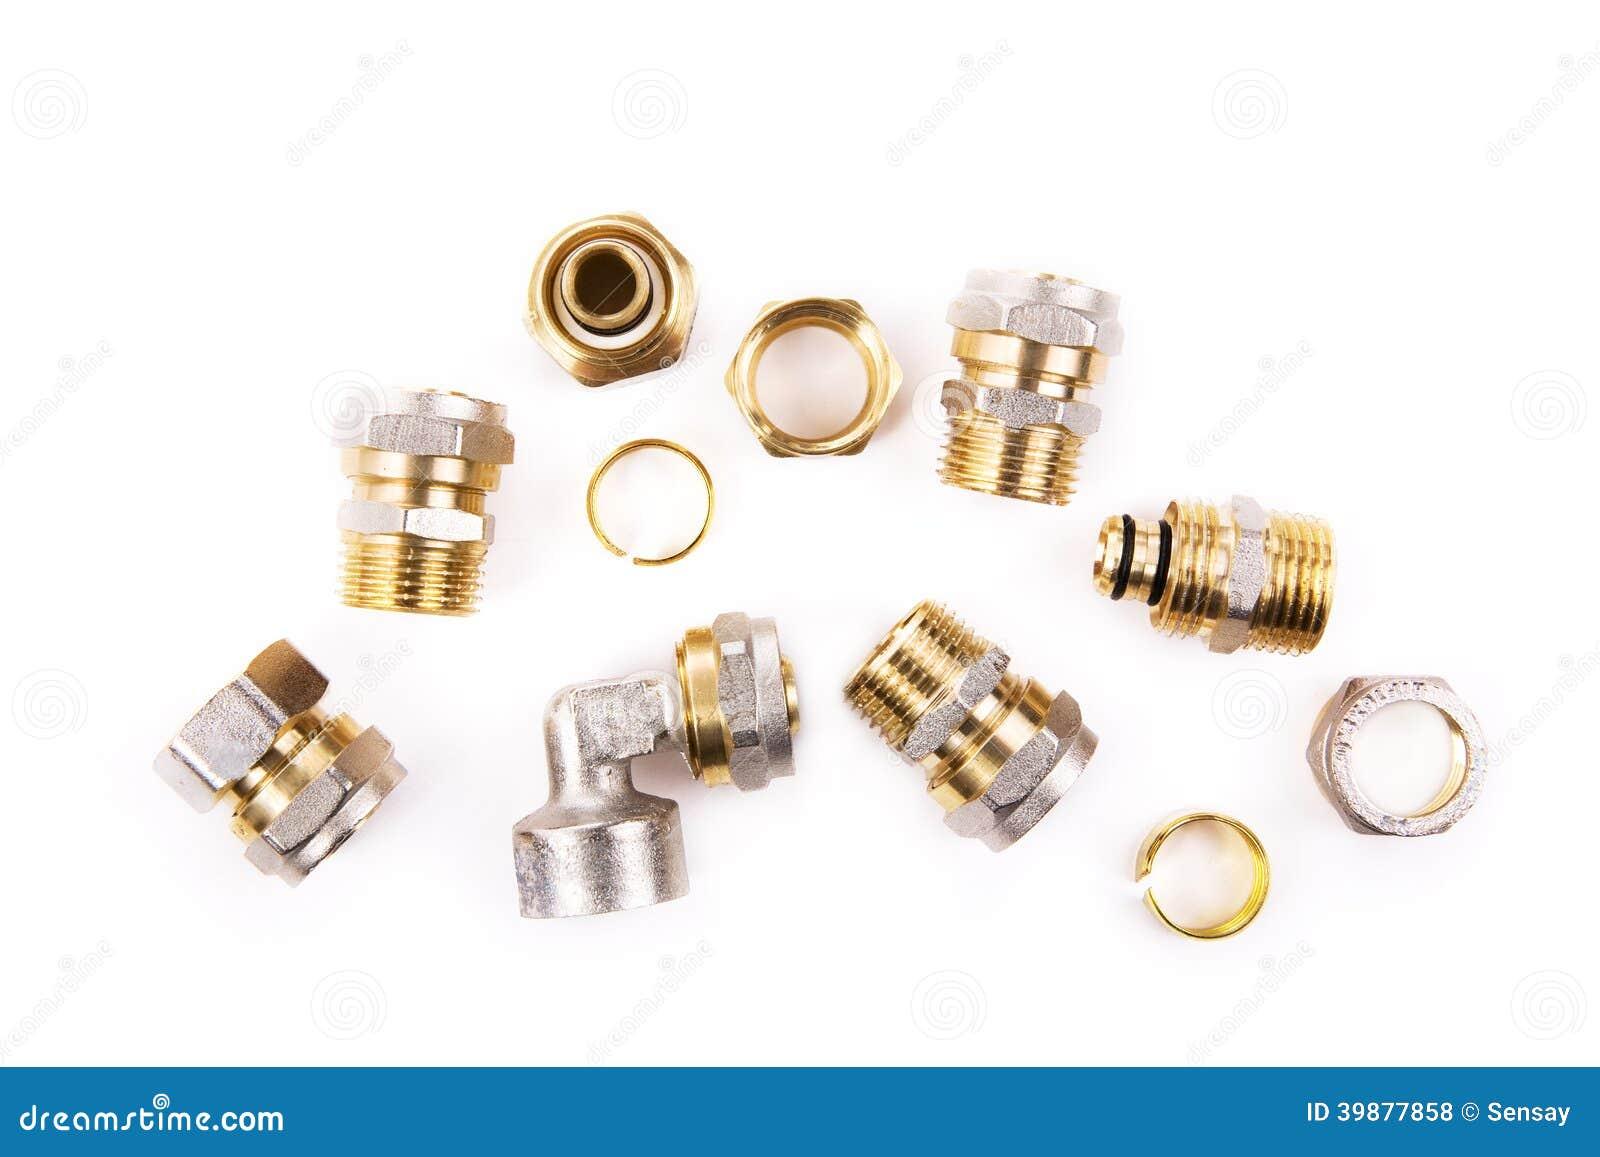 Plumbing Fittings Stock Photo. Image Of Repair, Connector